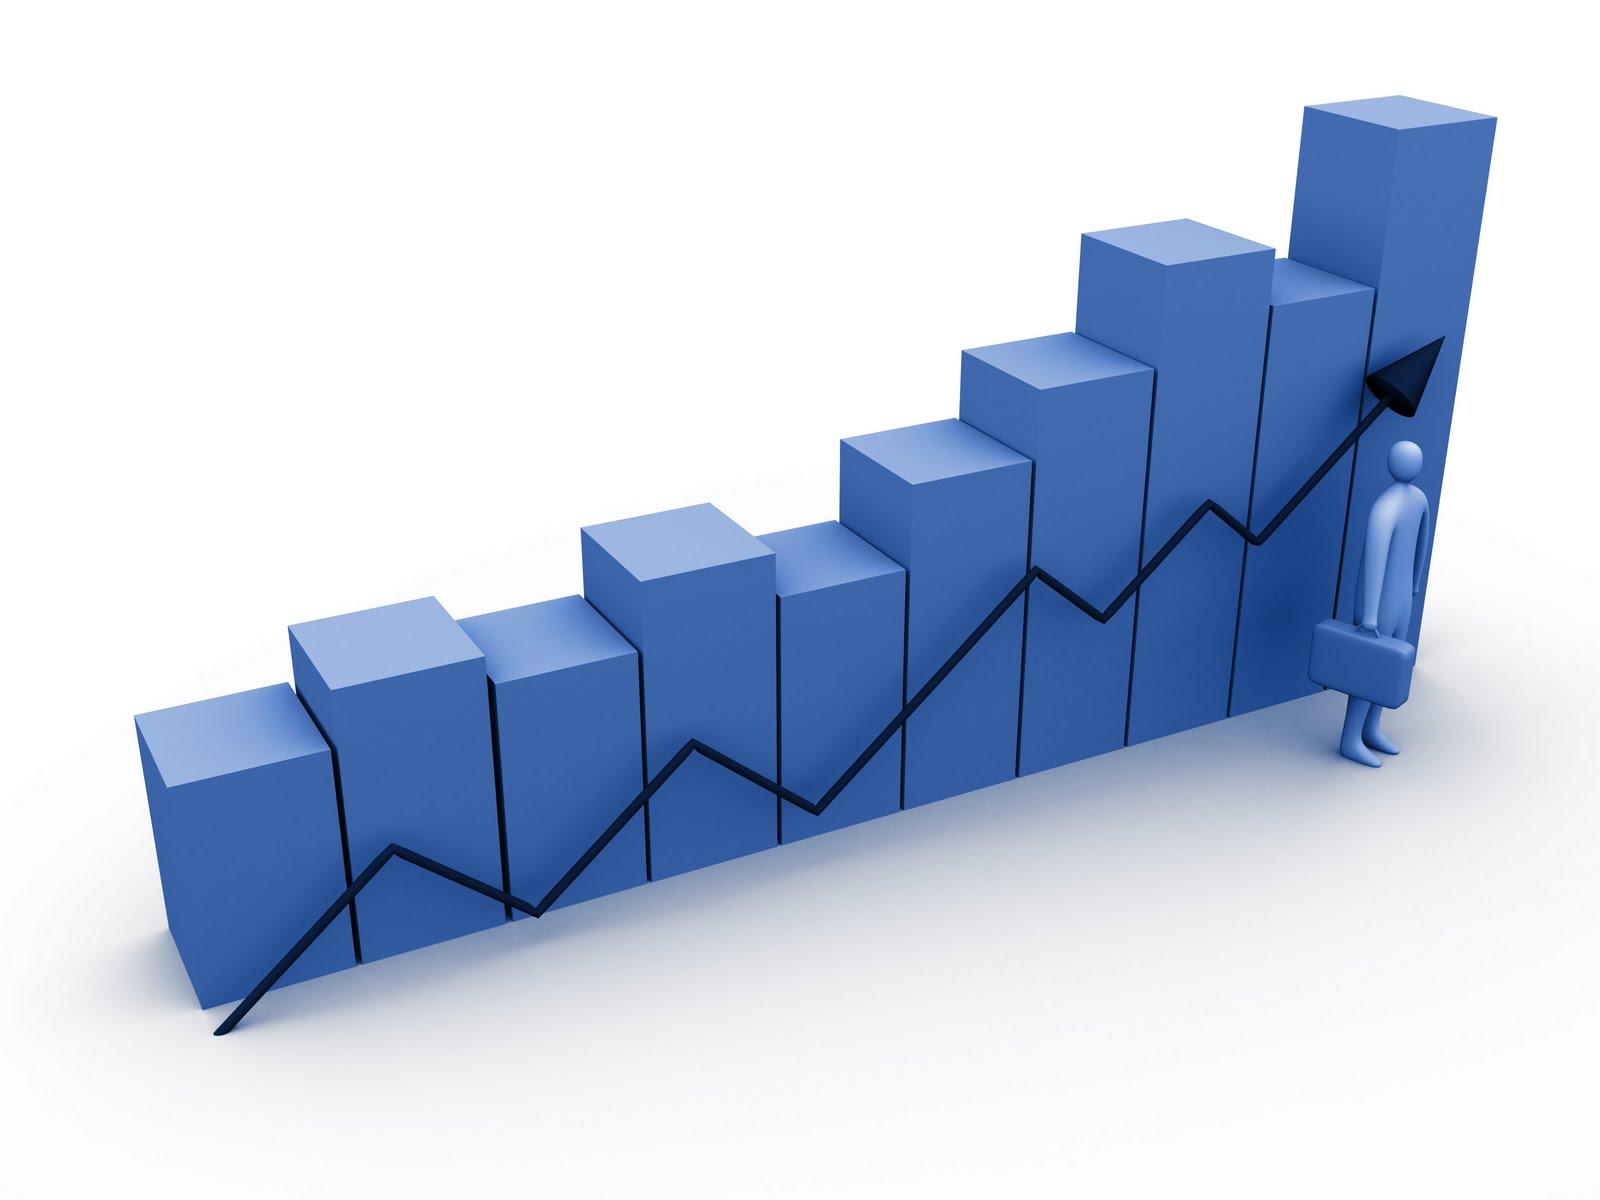 grafico de aumento